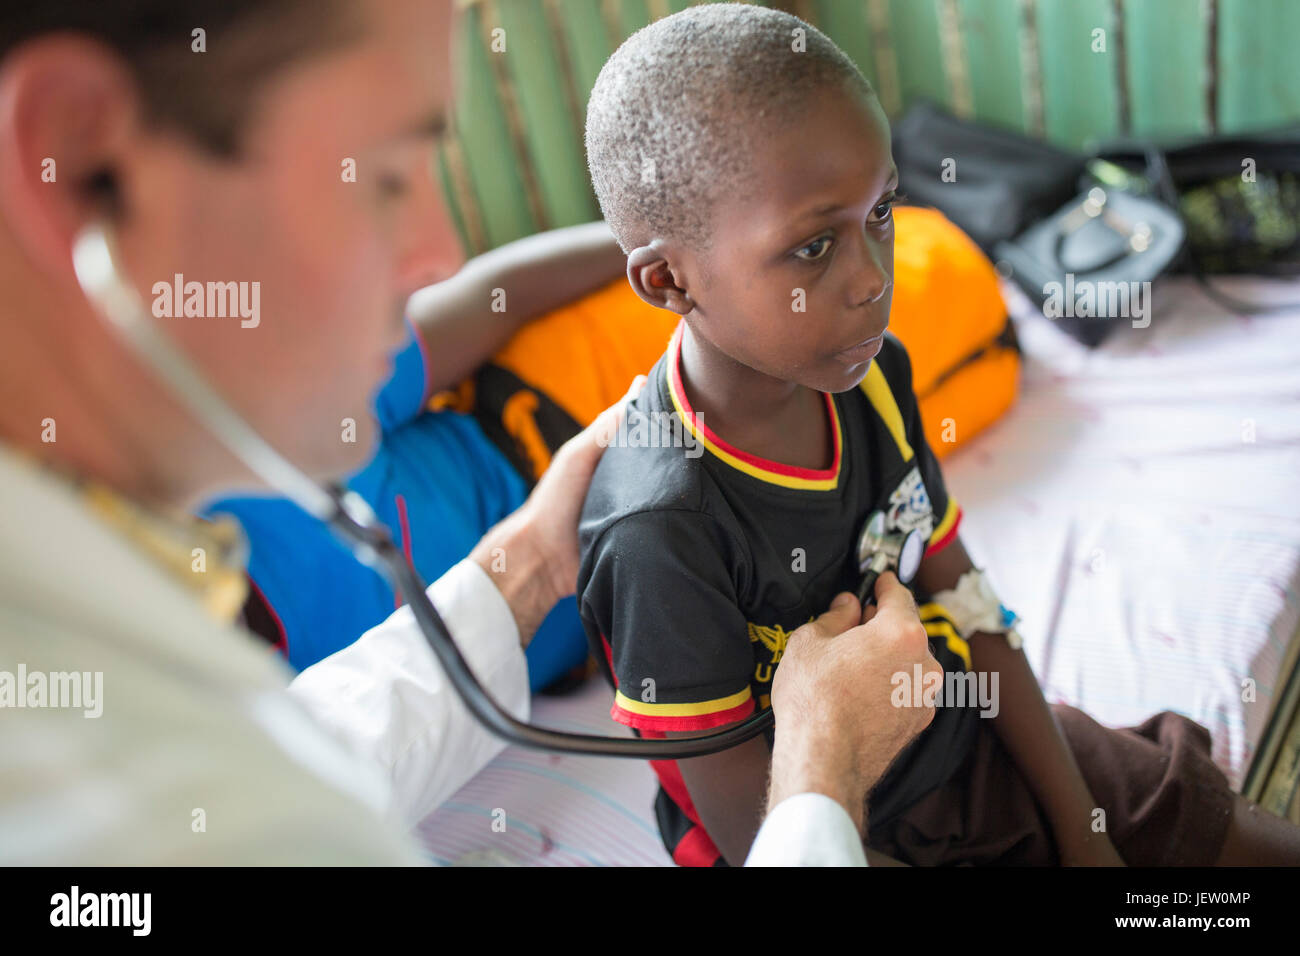 An expat missionary doctor works on the pediatric ward at Bundibugyo Hospital, Uganda. - Stock Image